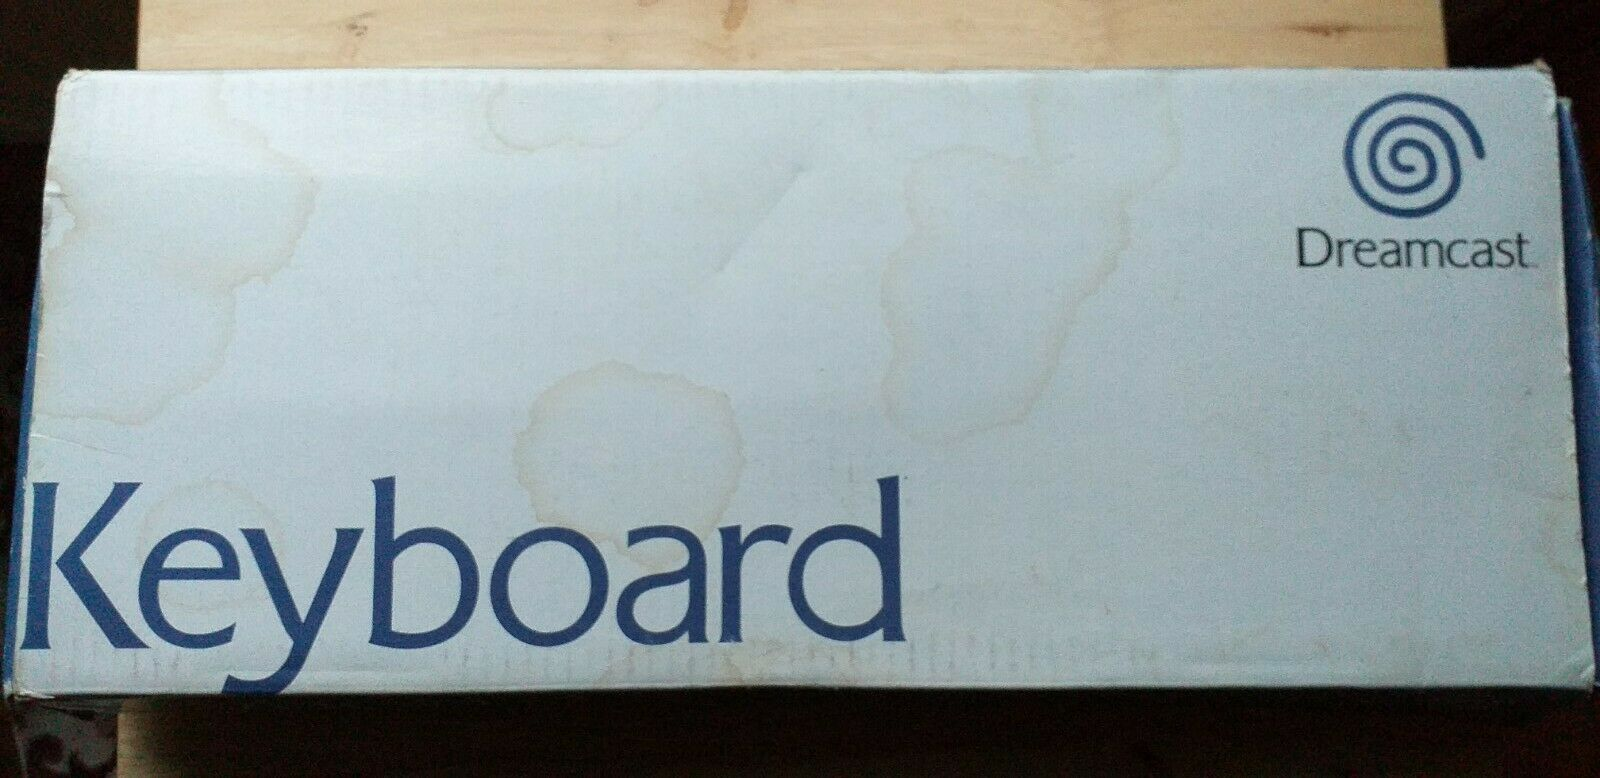 Sega Dreamcast Keyboard Boxed